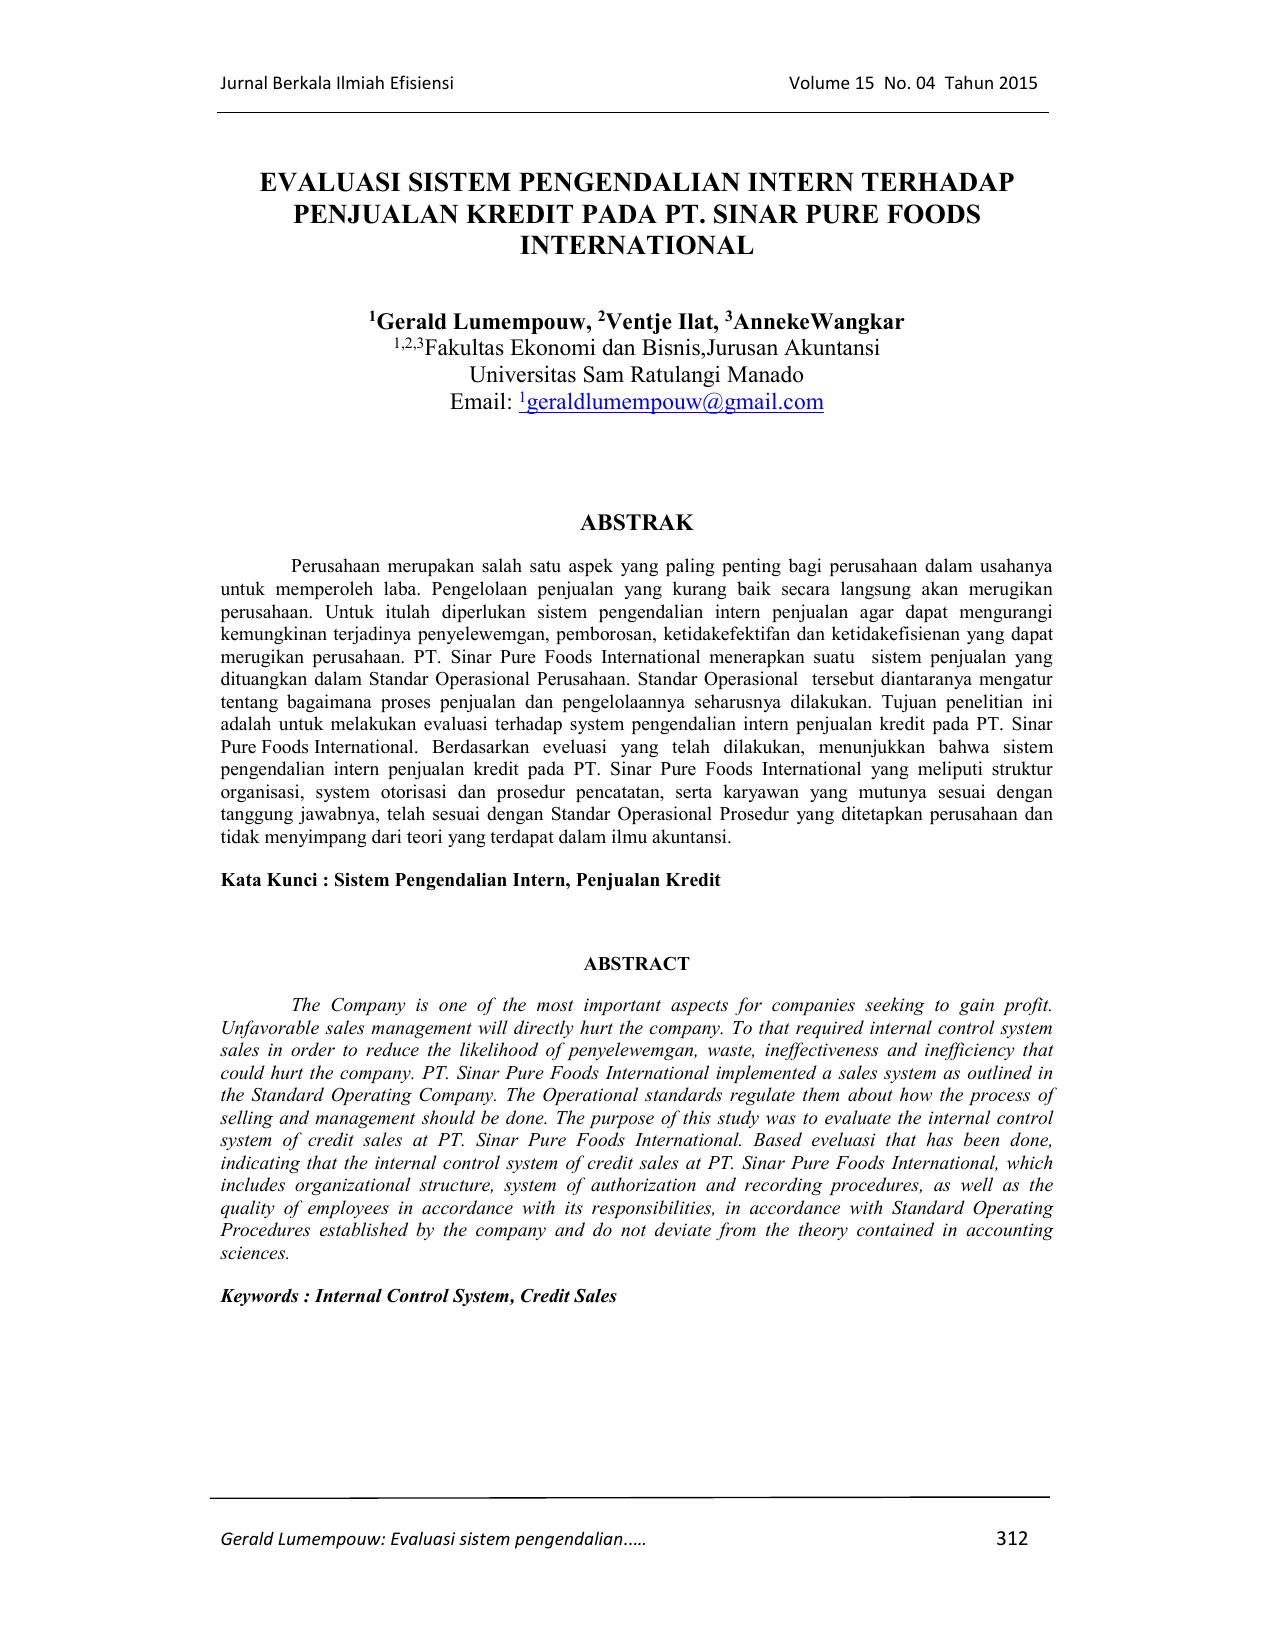 Evaluasi Sistem Pengendalian Intern Terhadap